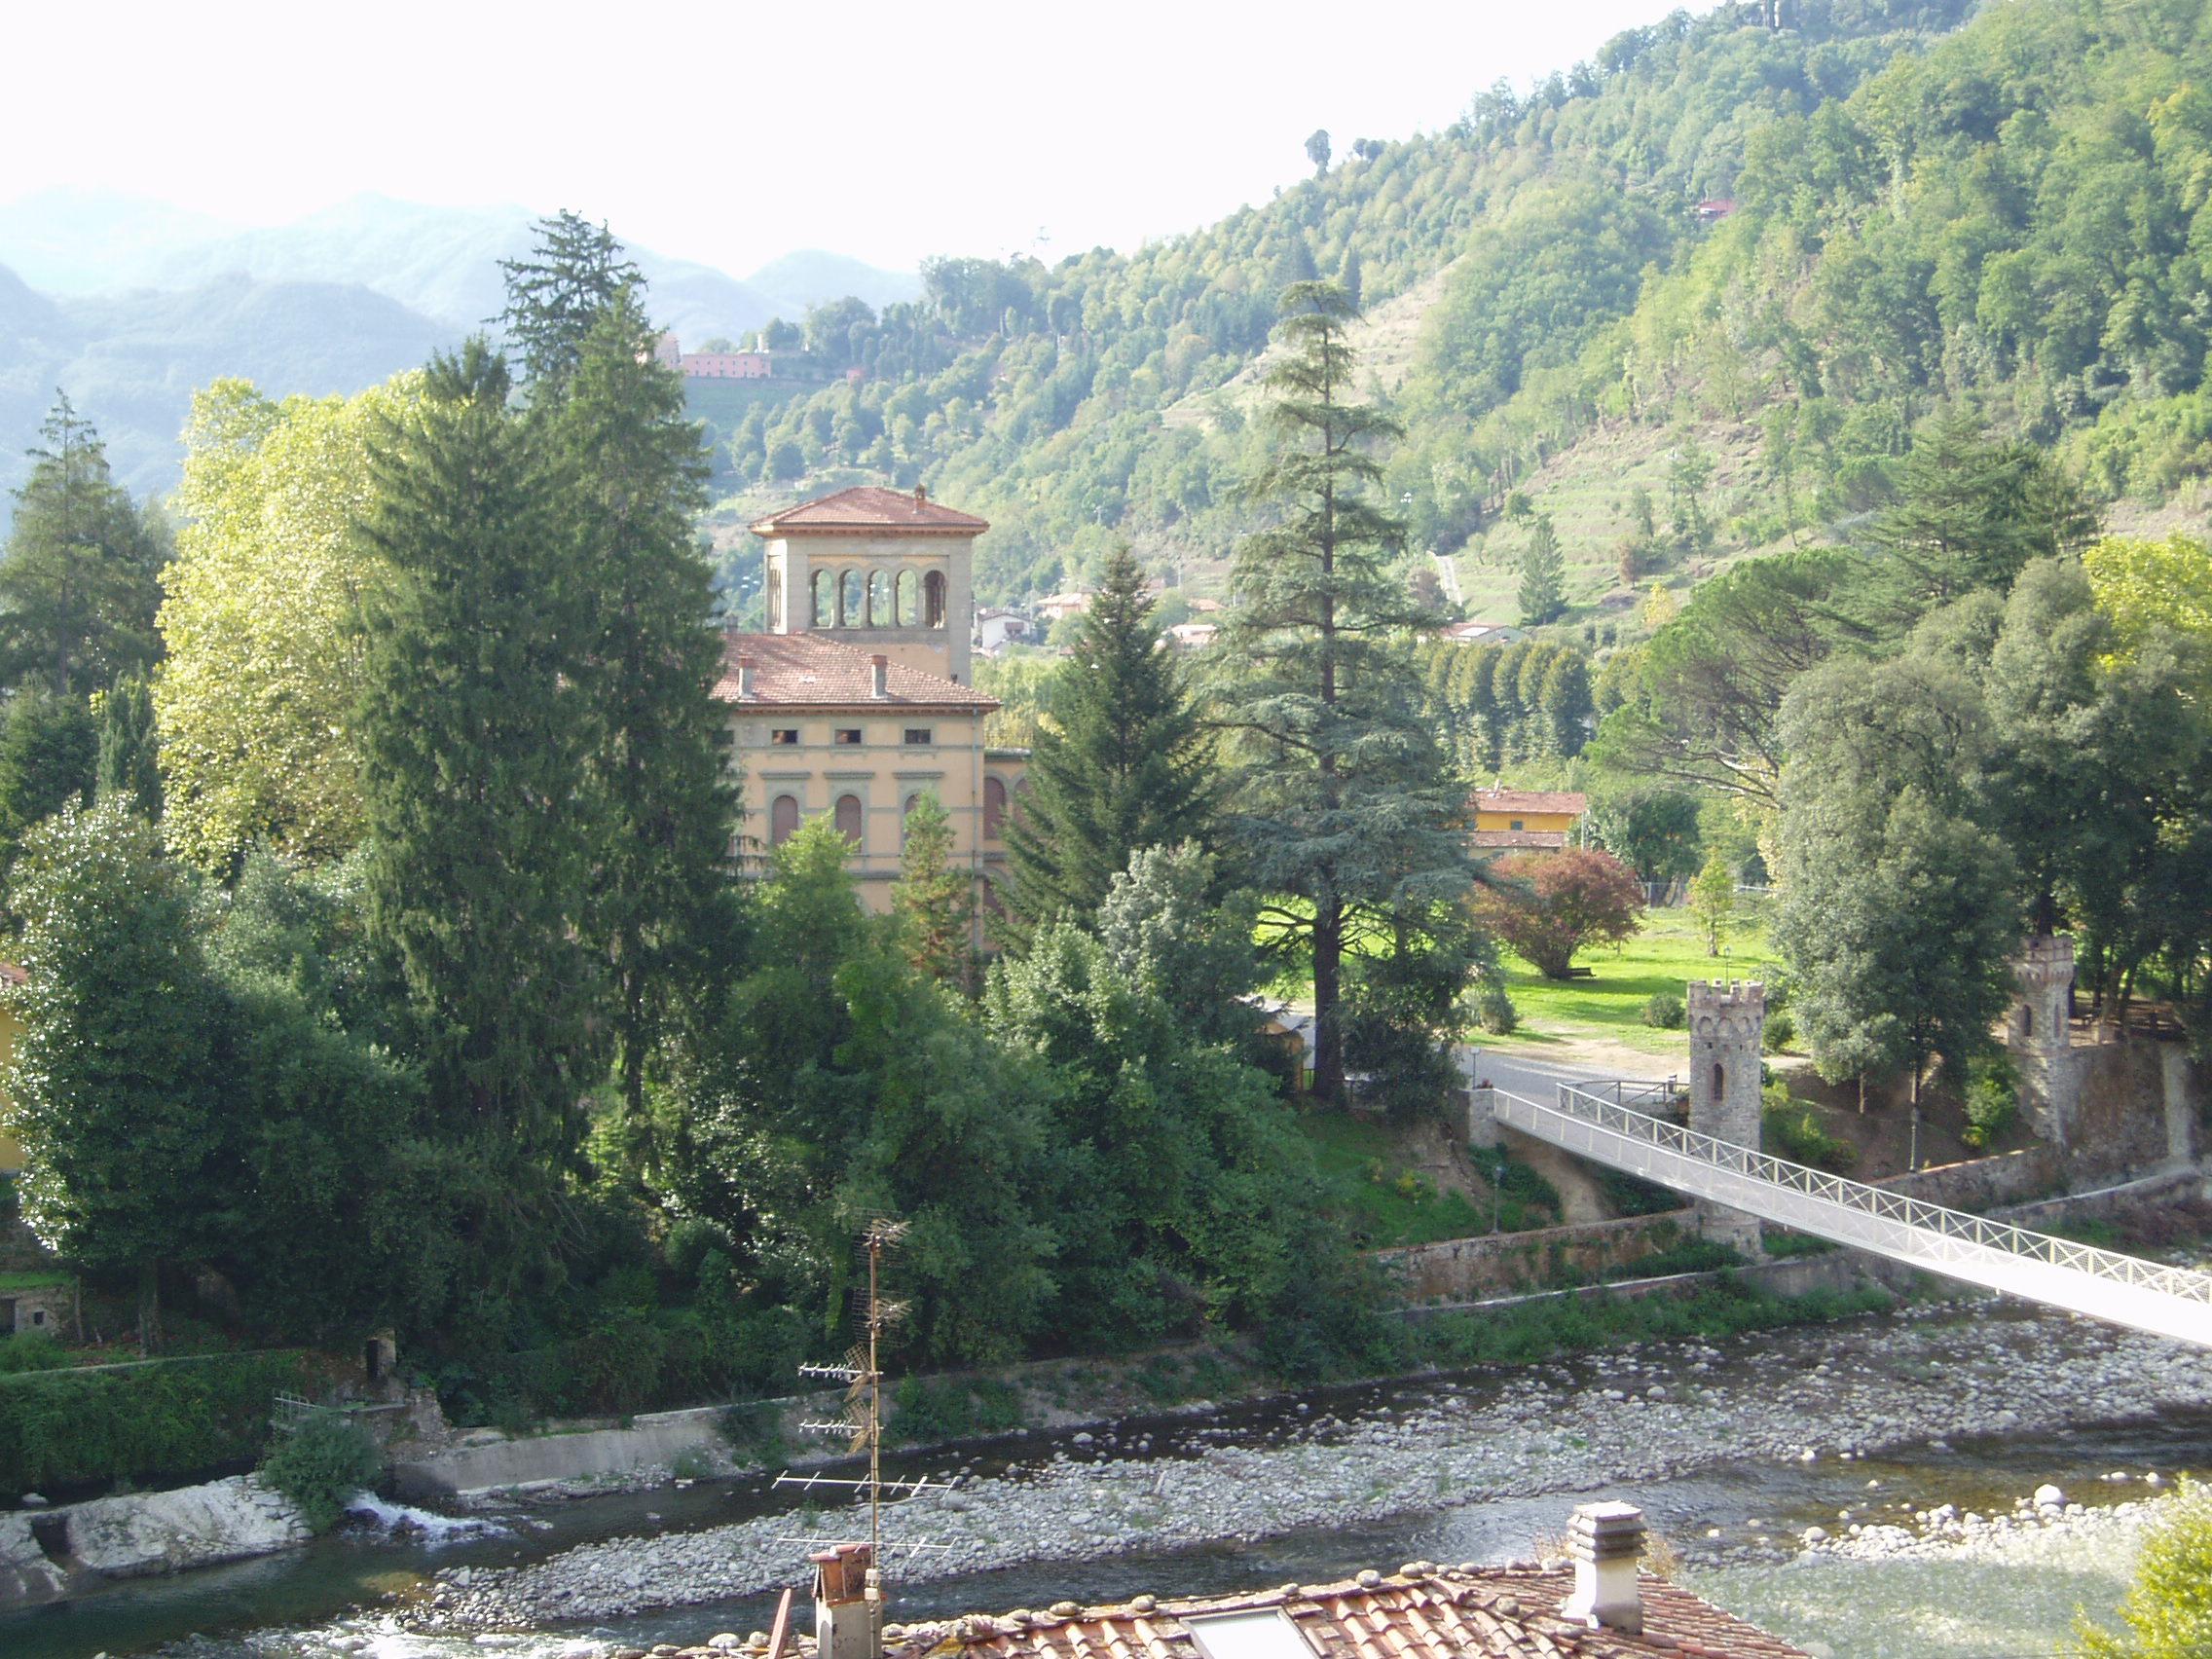 Passerella | Bagni di Lucca and Beyond